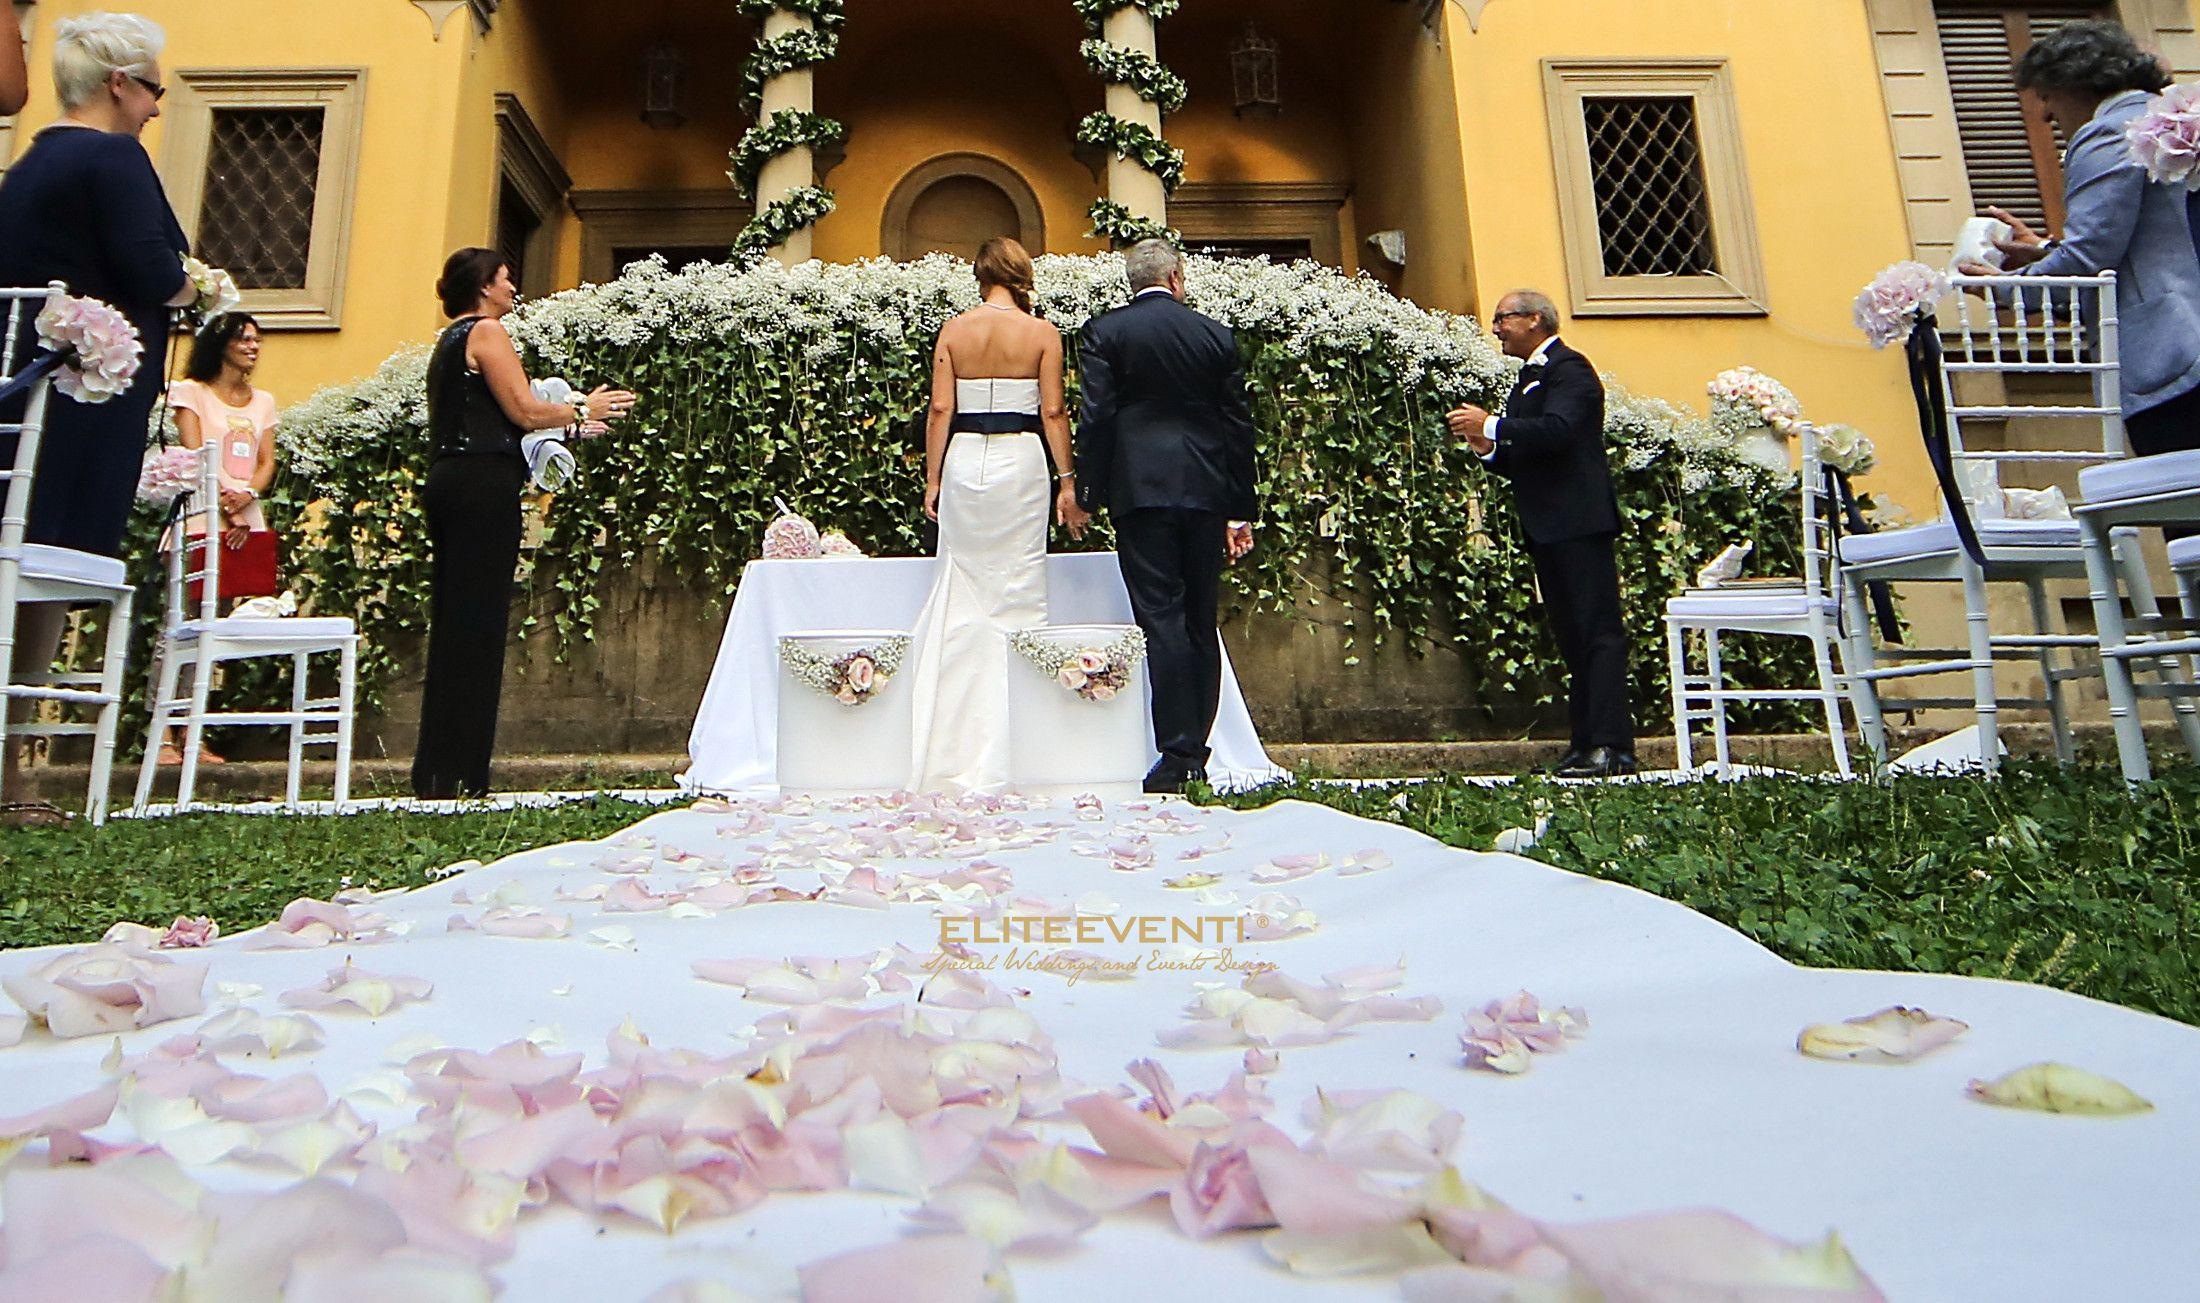 Allestimento_tuscany_wedding_by_Eliteeventi